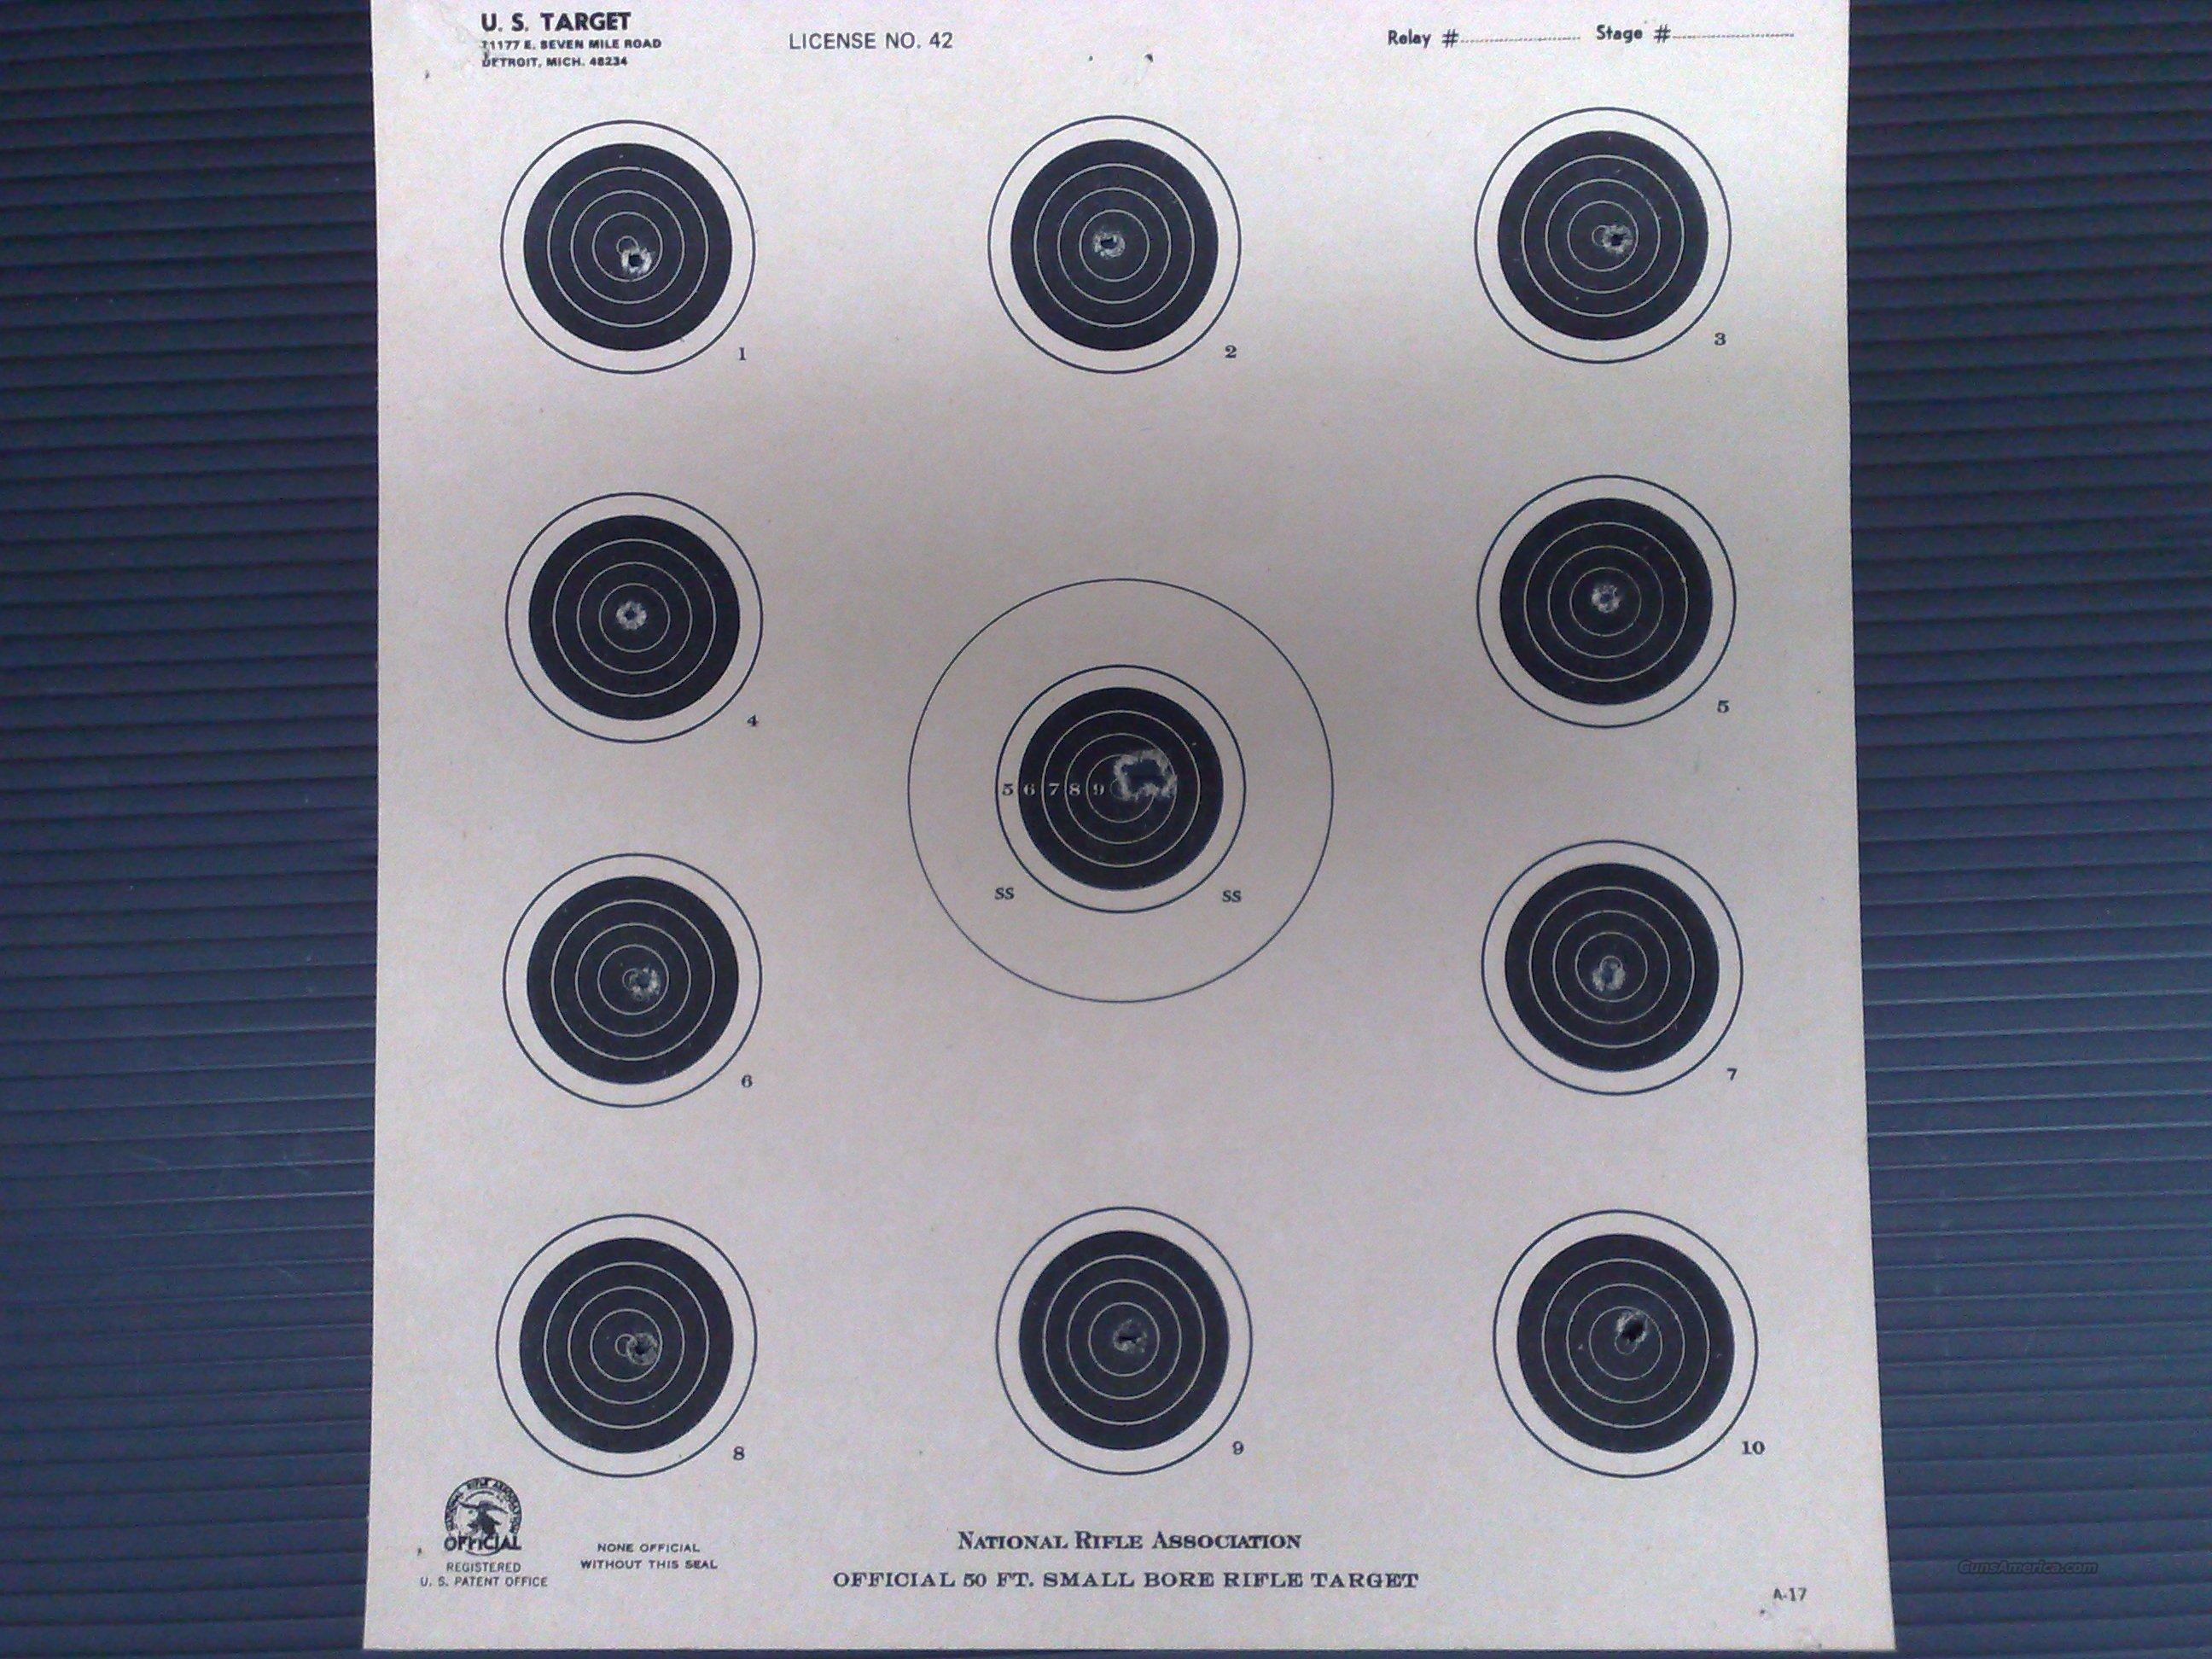 Weihrauch 22 Lr Target Rifle Bolt Action For Sale